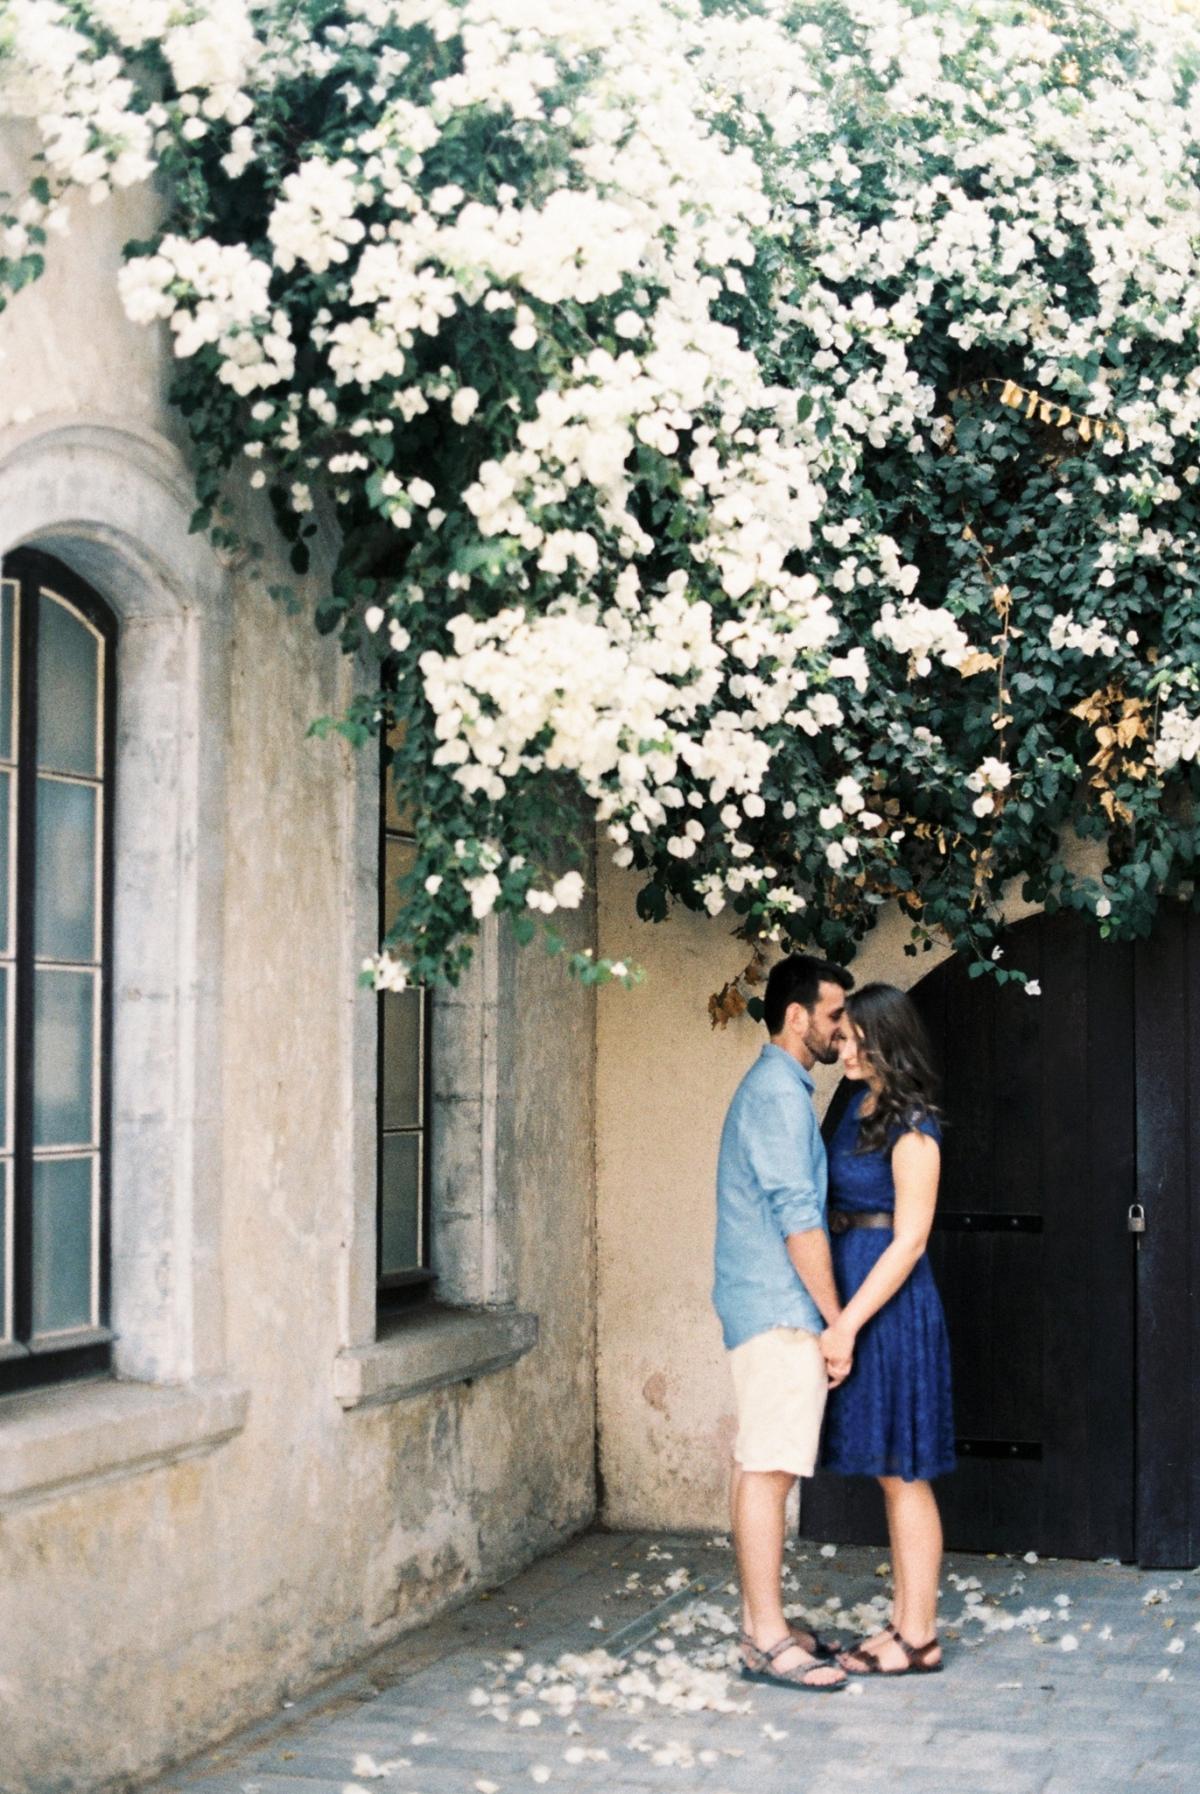 Hatachana Tel Aviv Engagement - Galia and Michael - Sigala Photography_0001